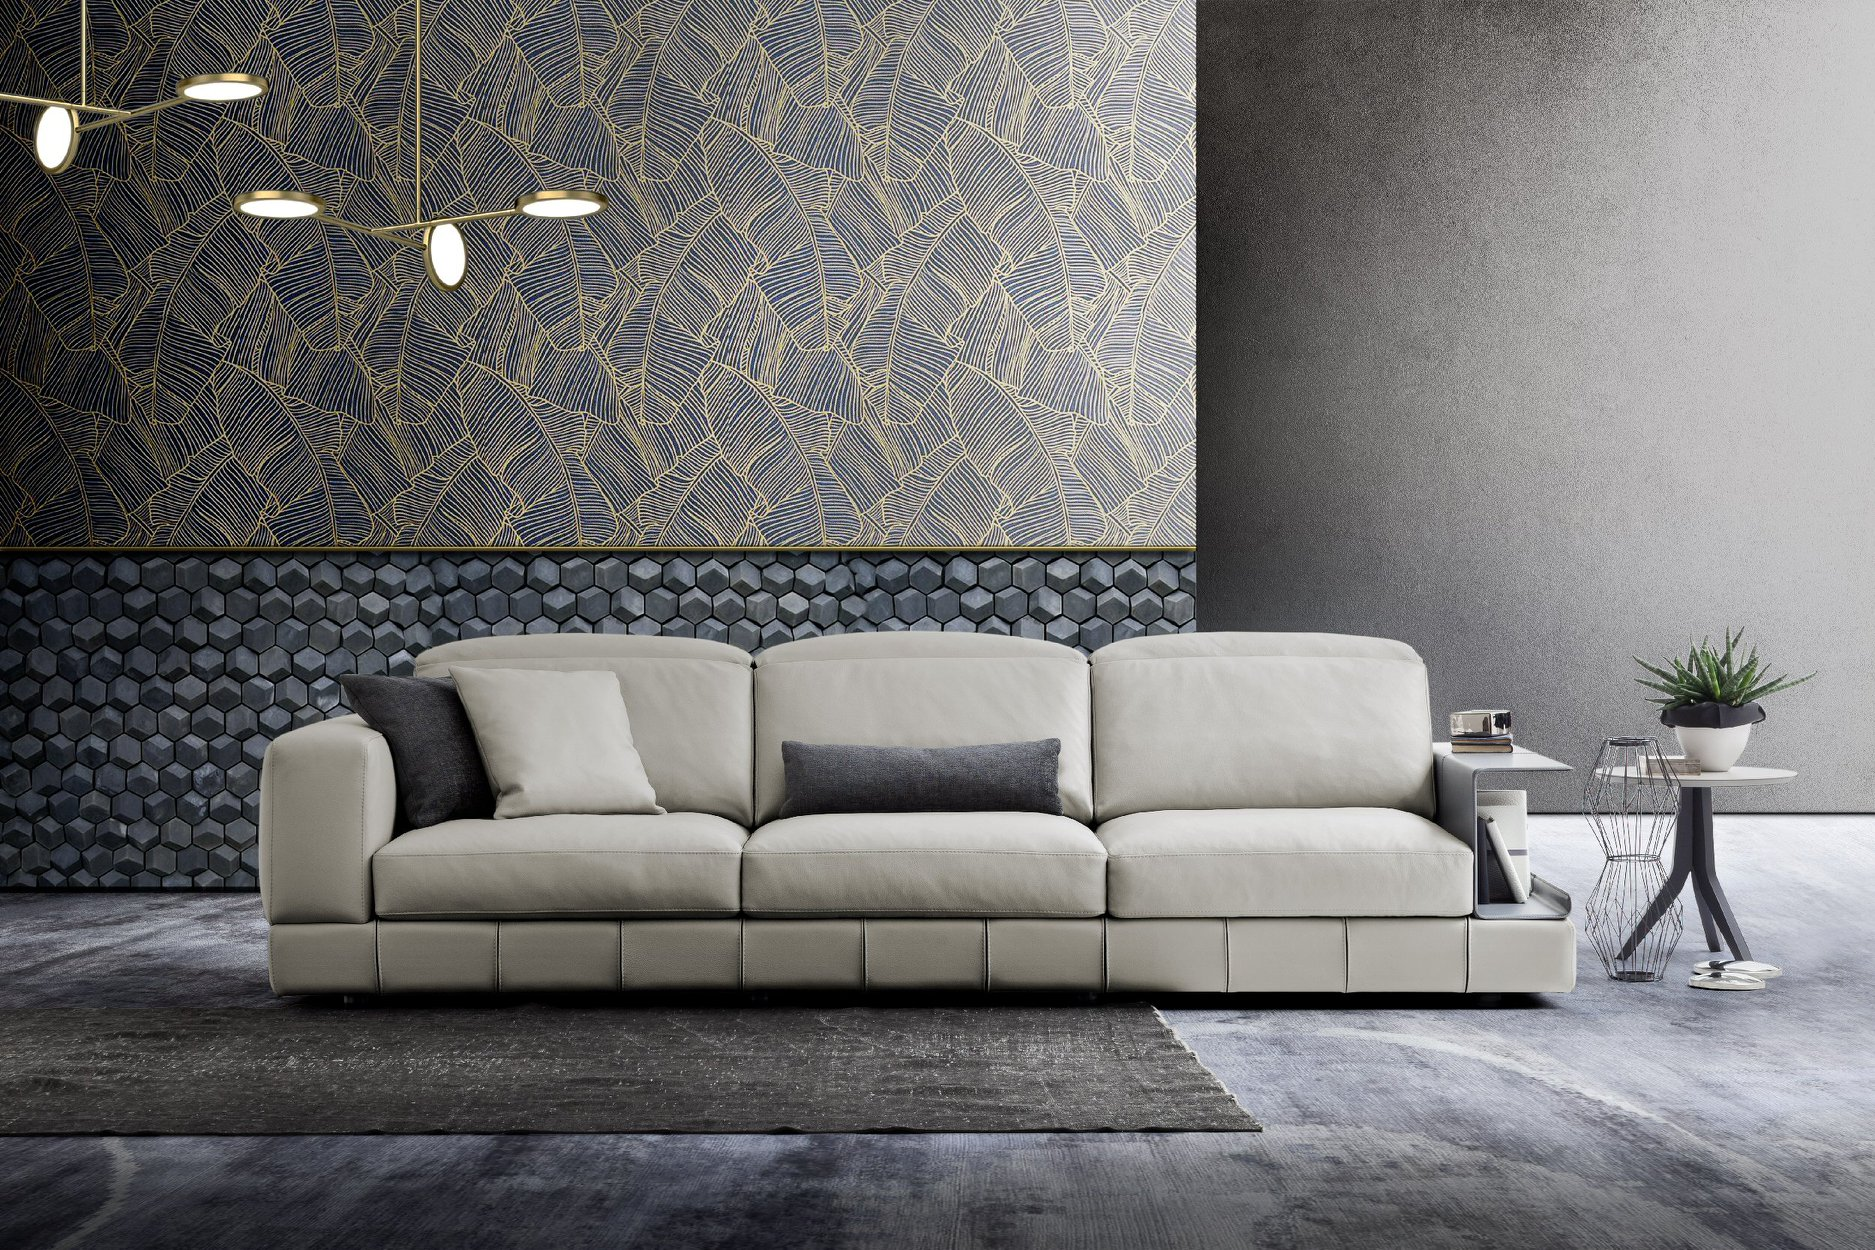 Grand Rest sofa